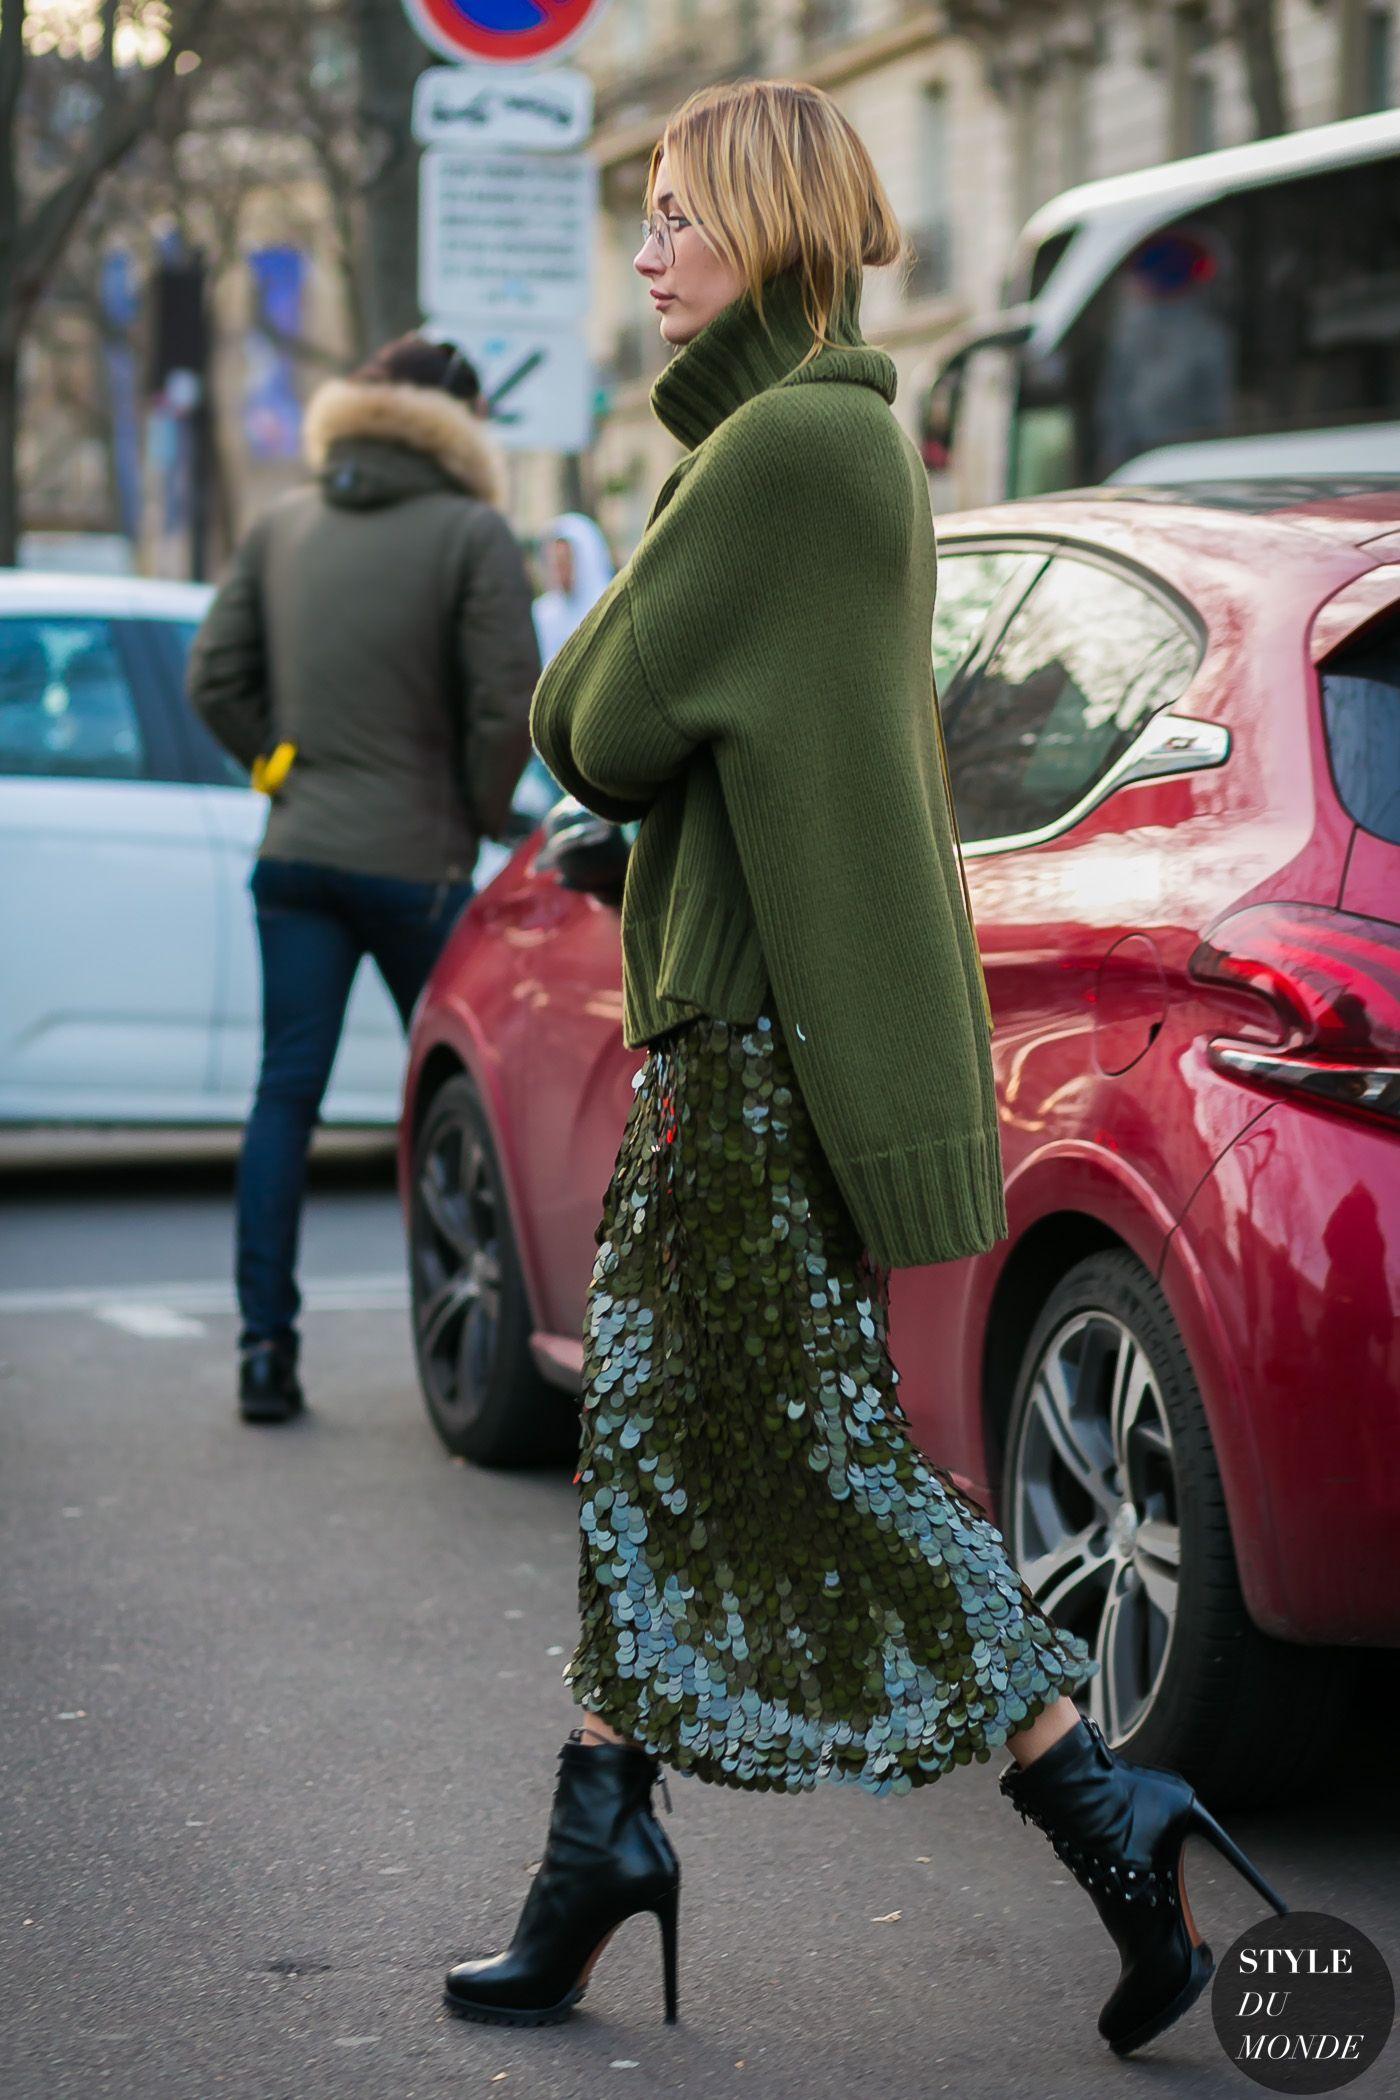 101 Besten Winter und Herbst Street Style Inspiration #trendystreetstyle